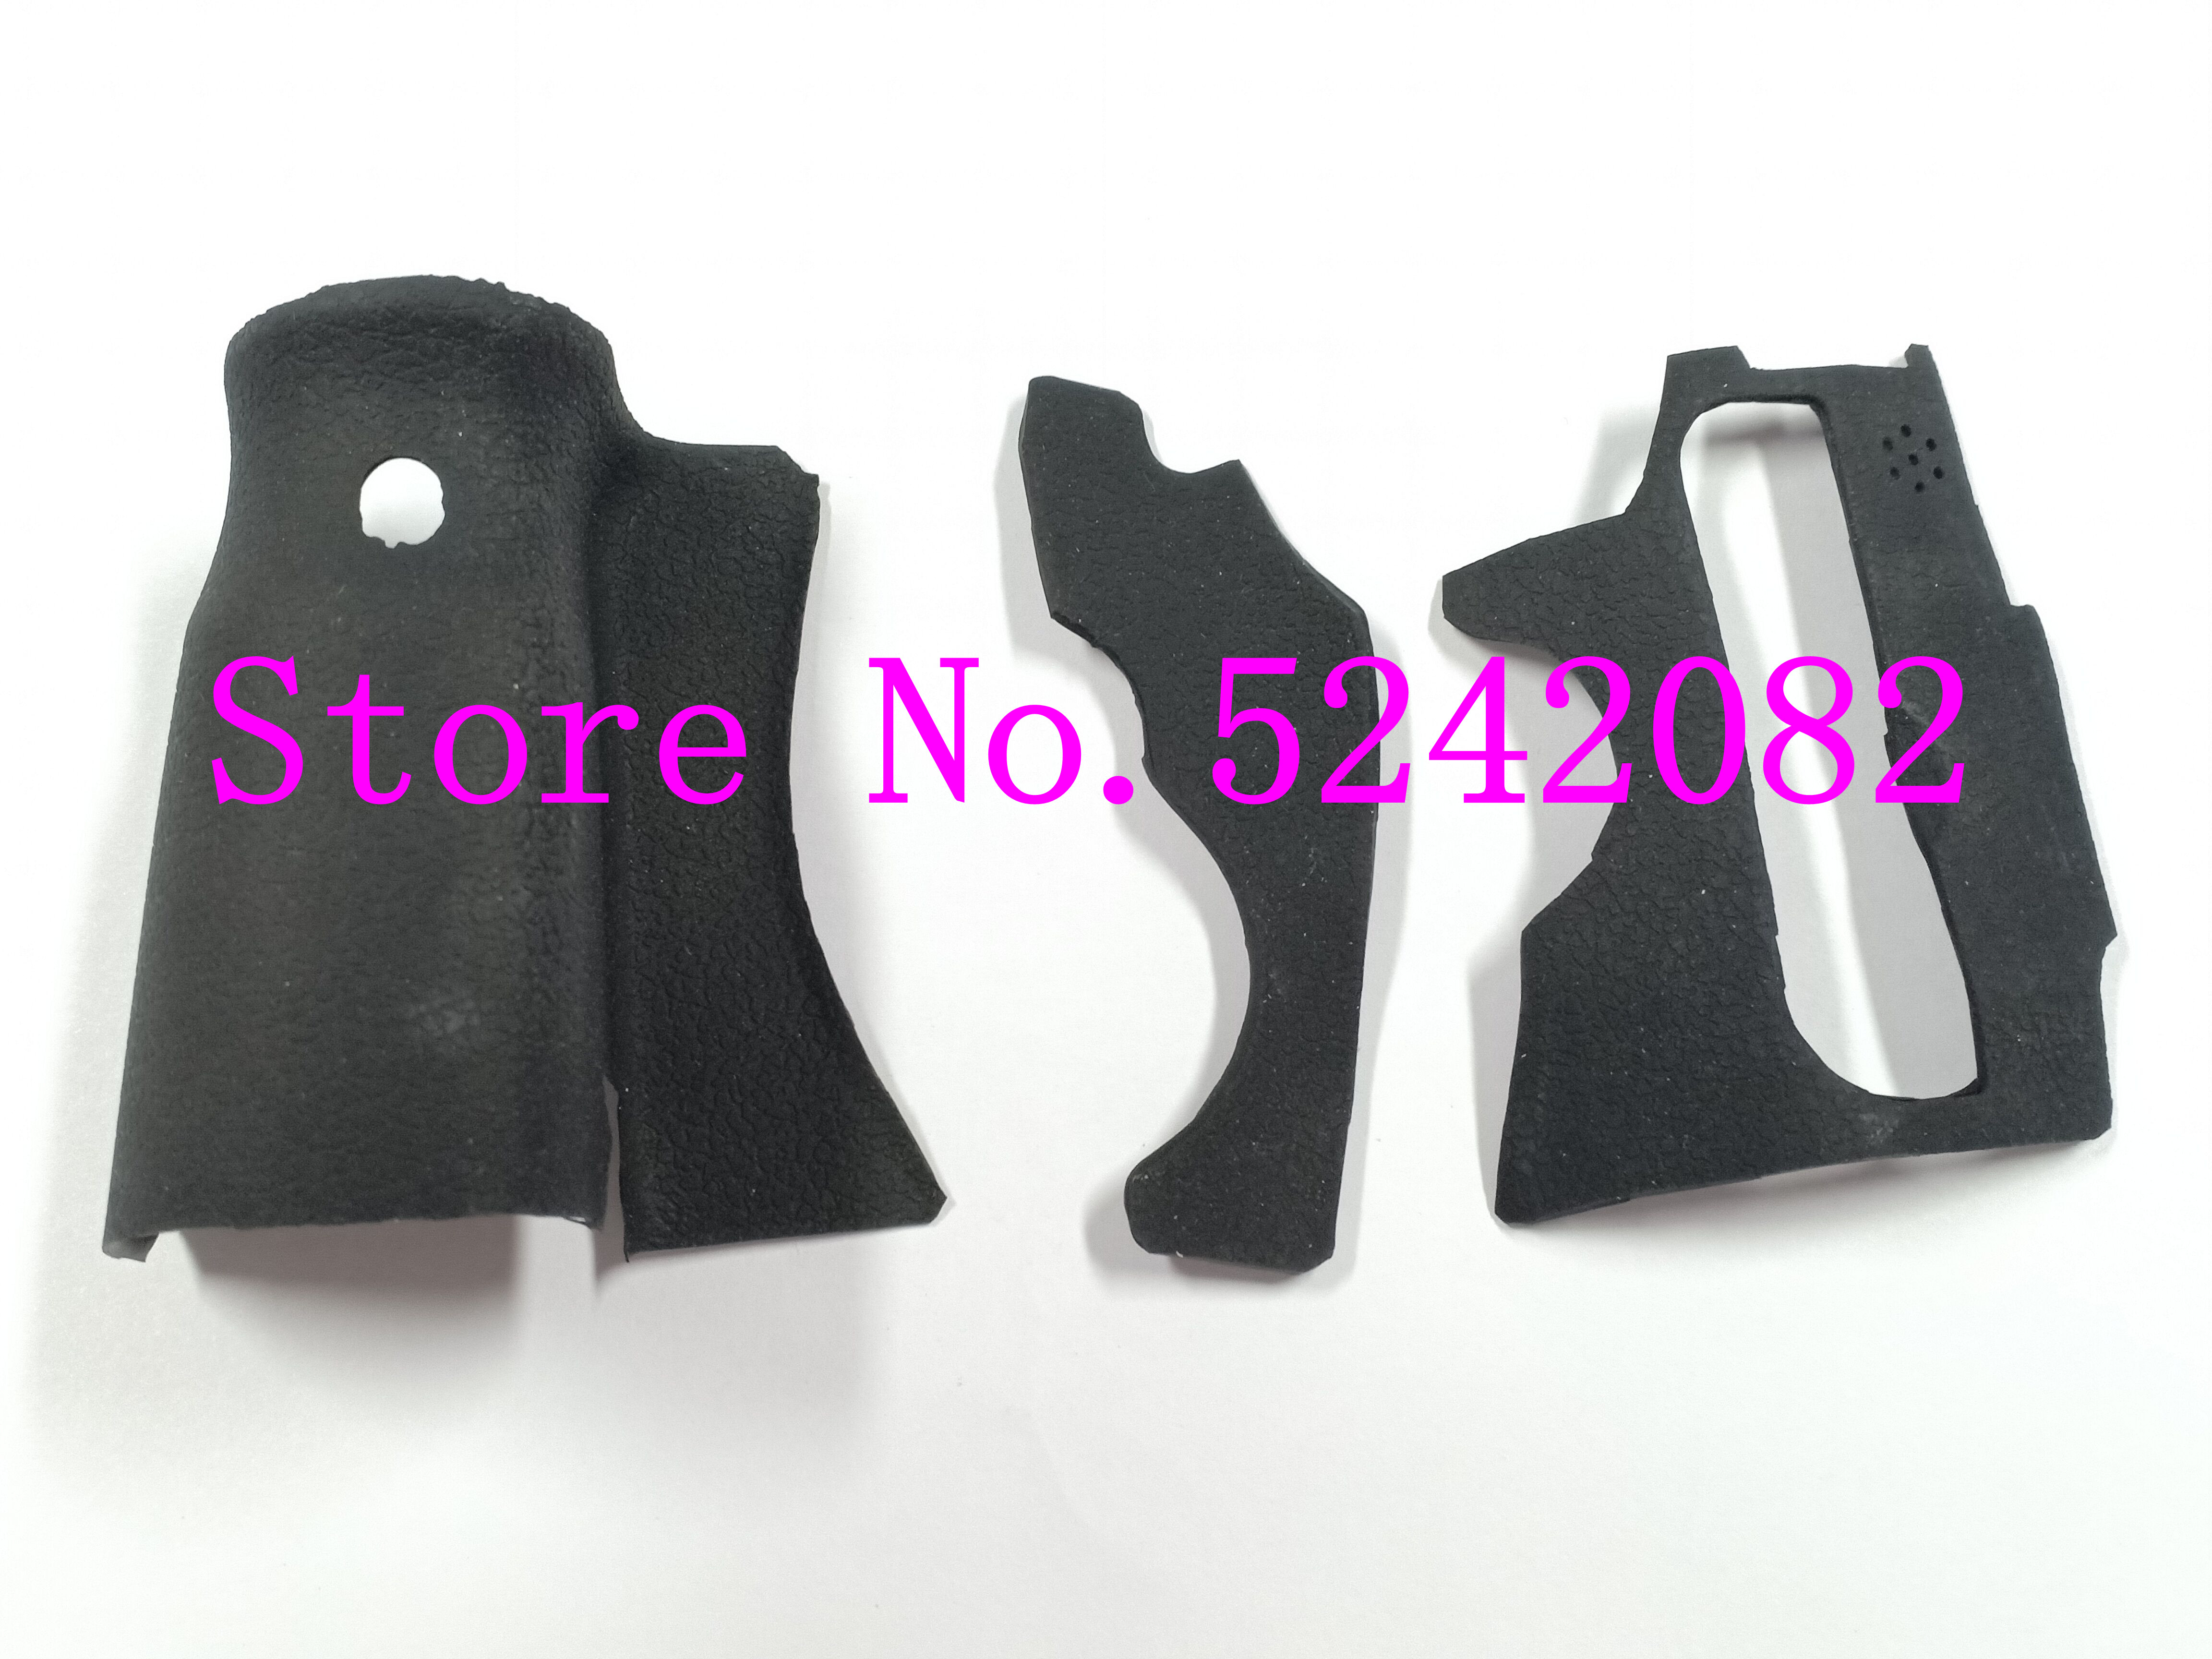 New A Set Of 3 Pieces Grip Rubber Unit For Canon 60D DSLR Rubber Replacement